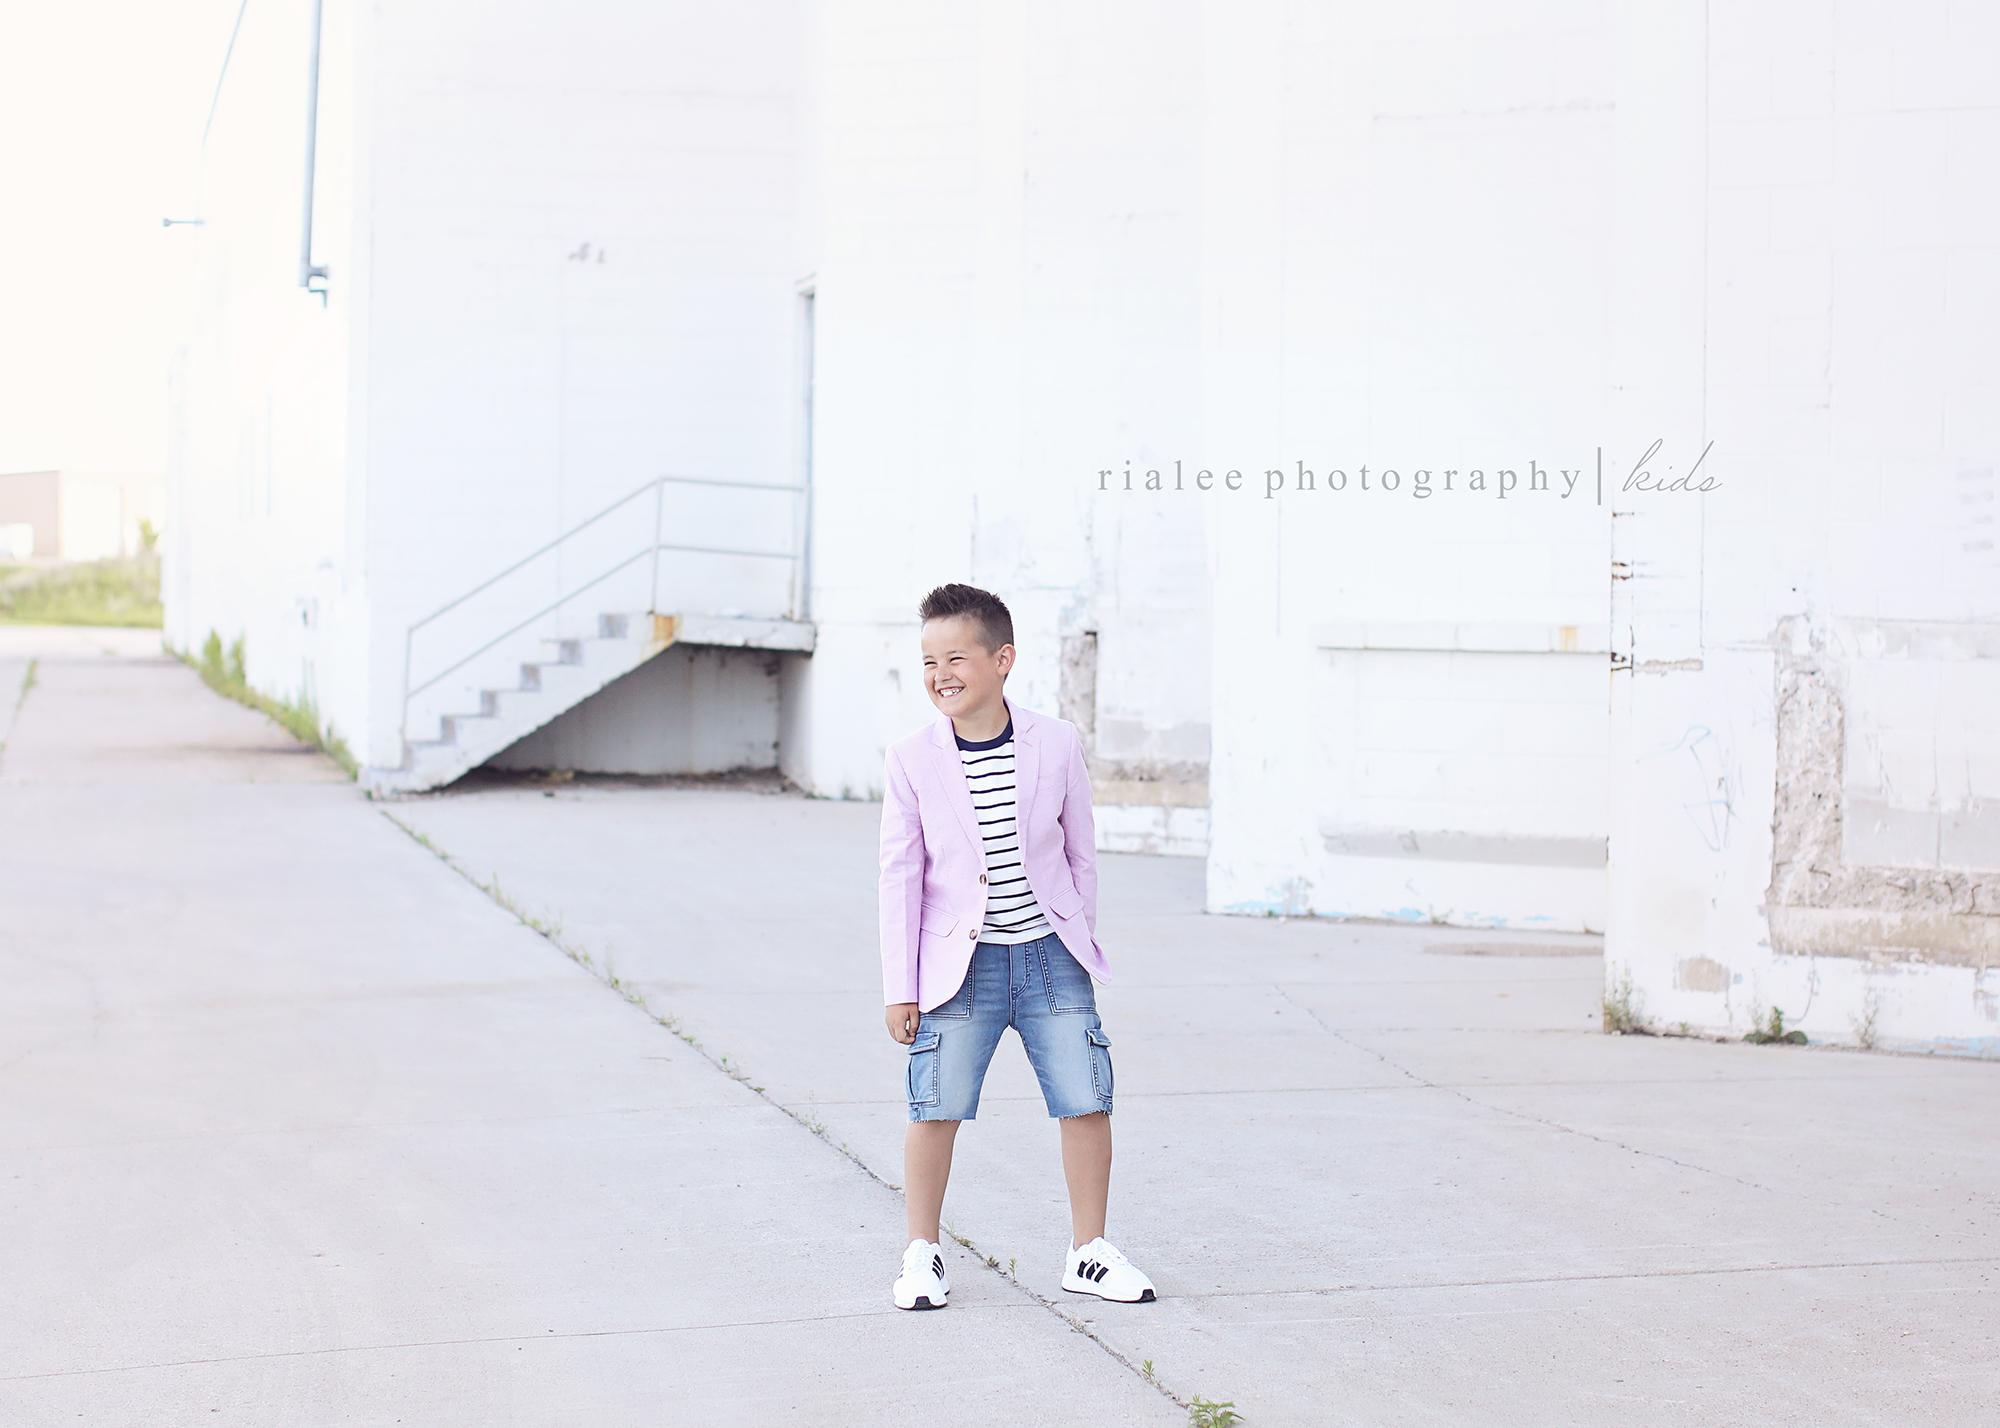 coolfargophotographers.jpg